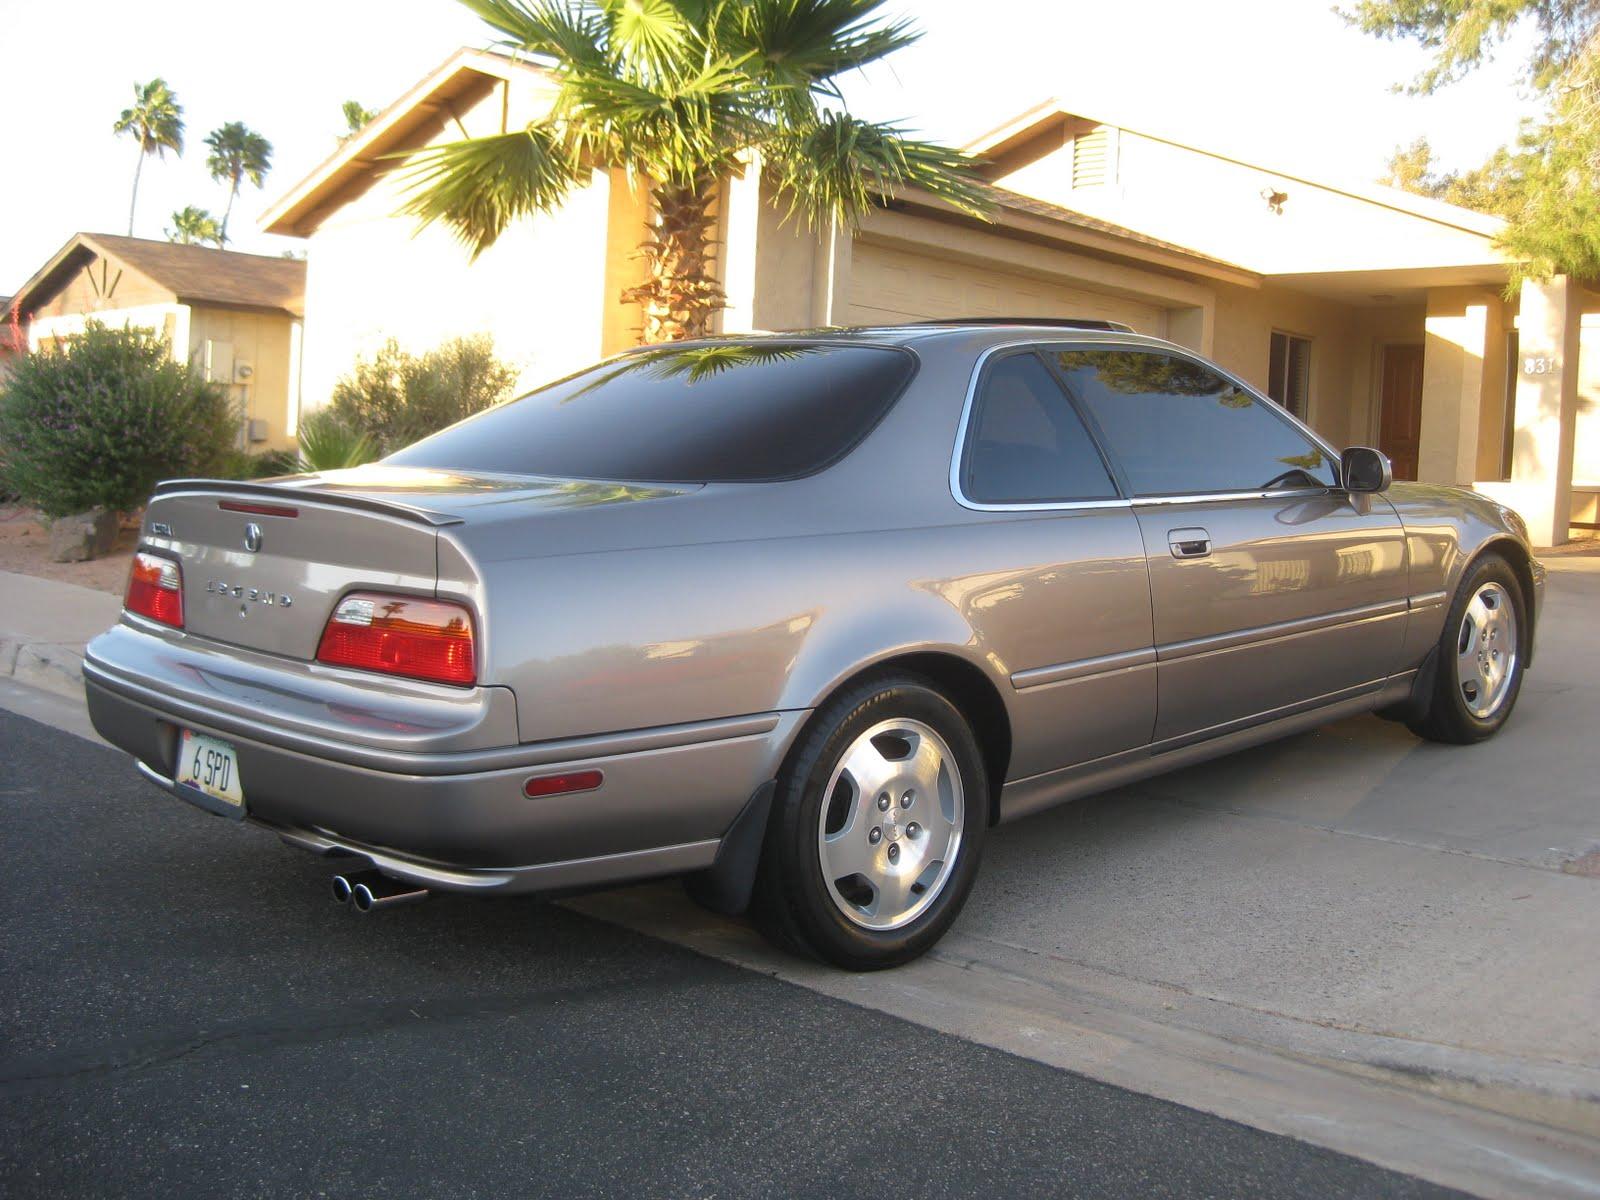 1994 Acura Legend Coupe Tirekicker Time Machine Launch